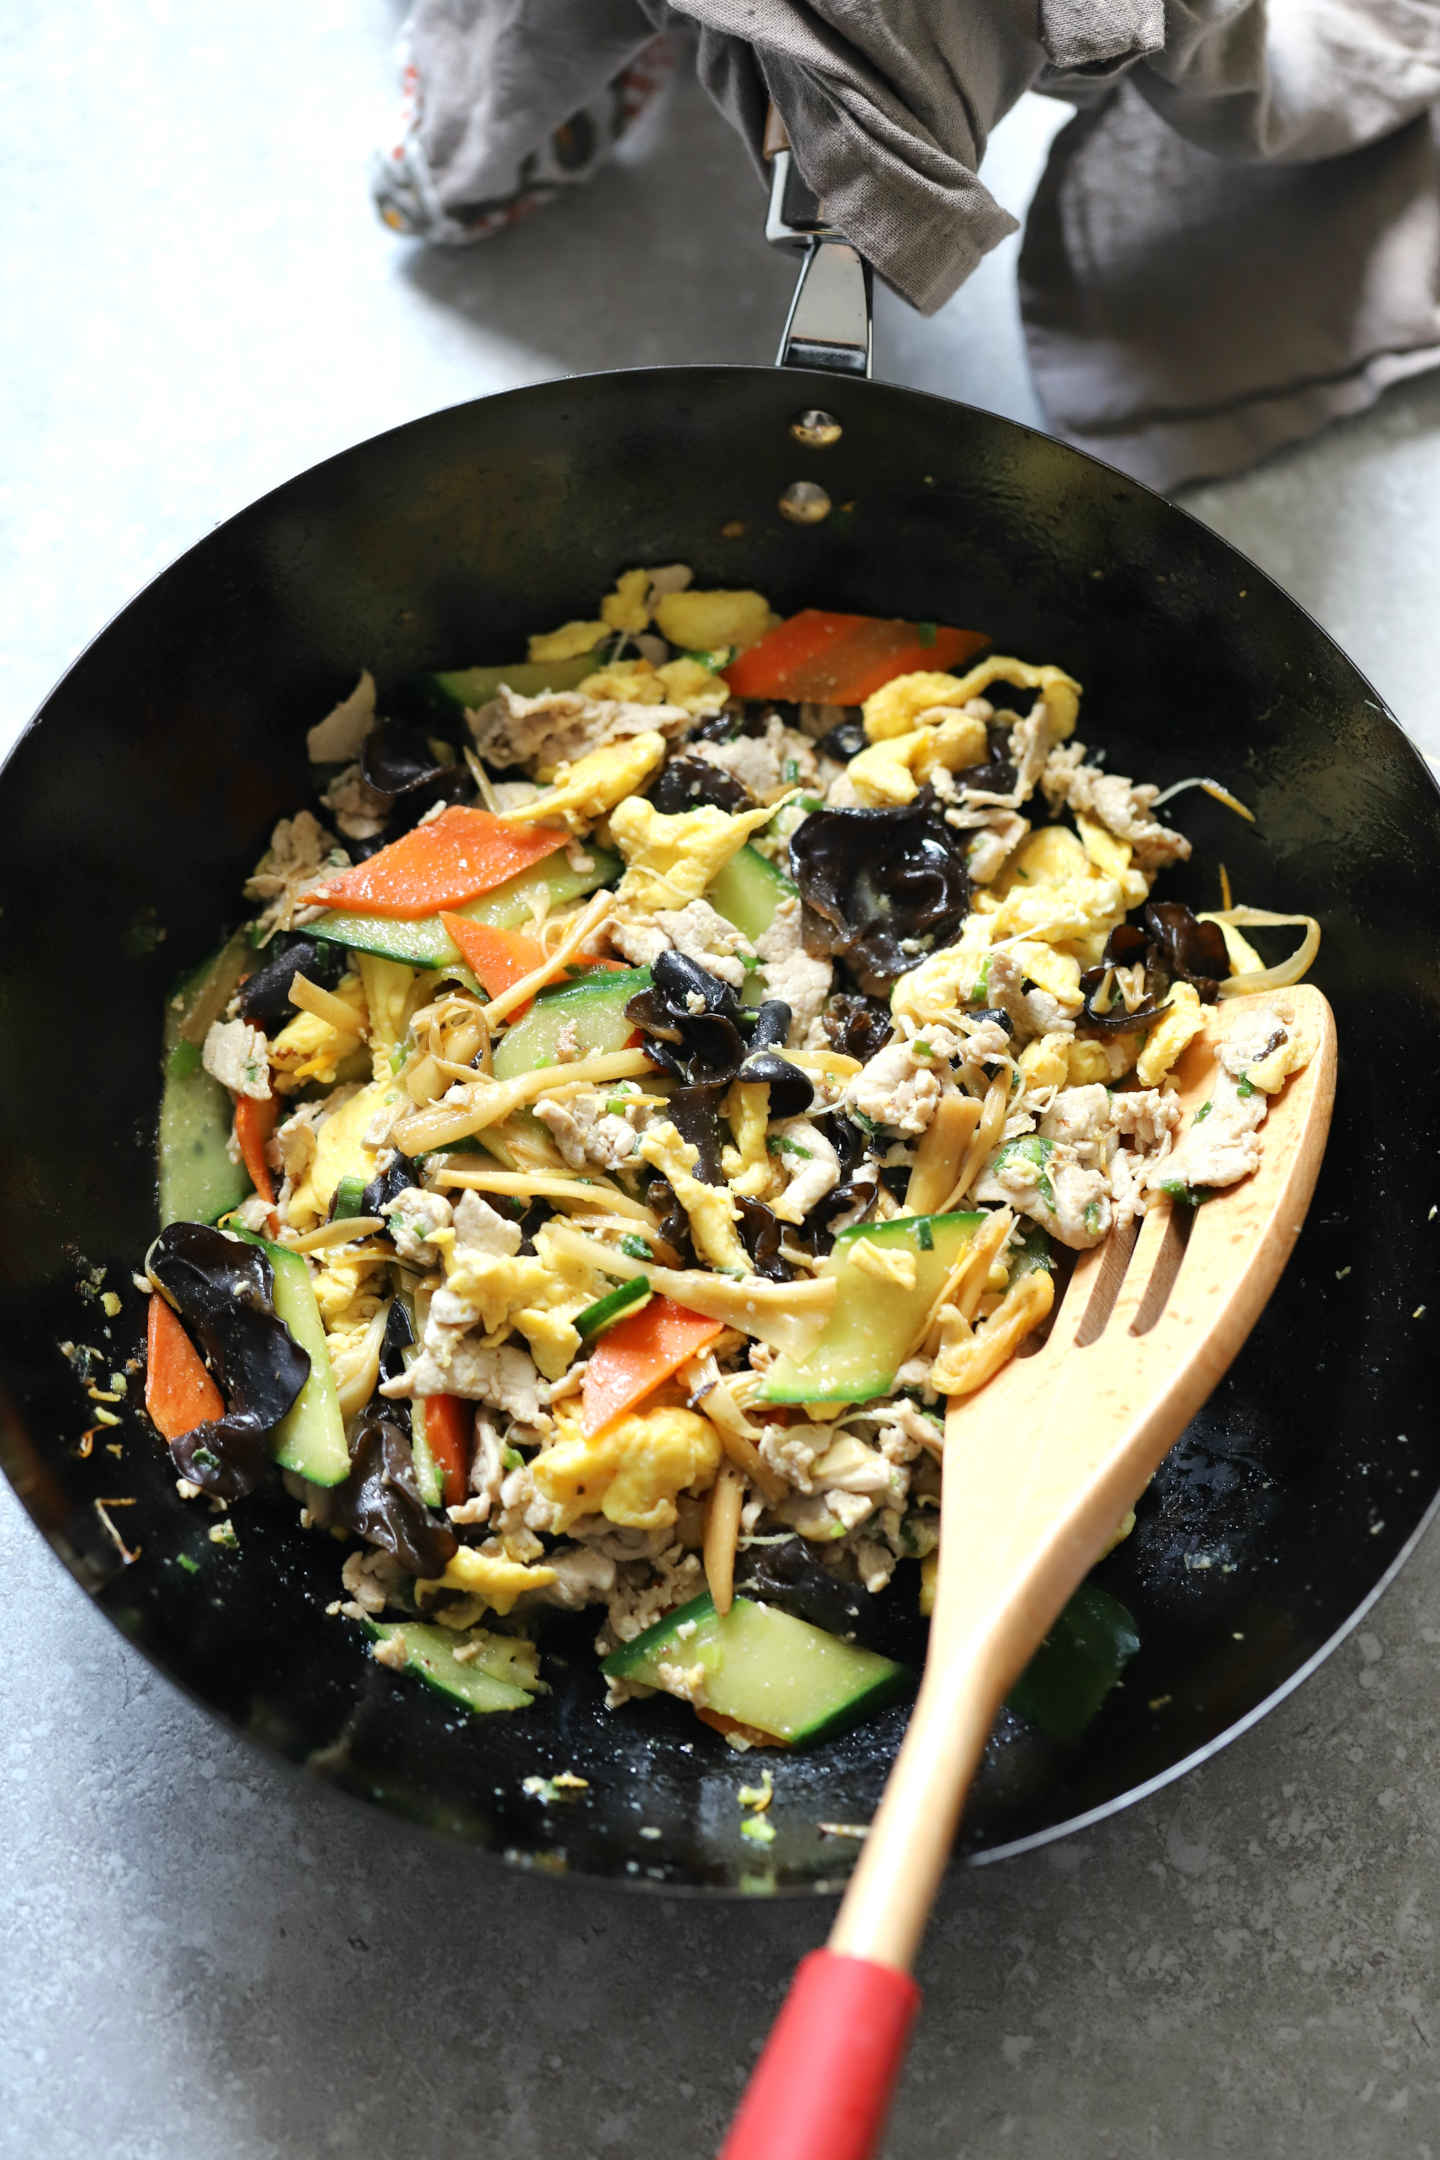 Moo Shu pork stir fry contains pork, eggs, wood ear mushrooms, lily flowers, cucumber and carrot